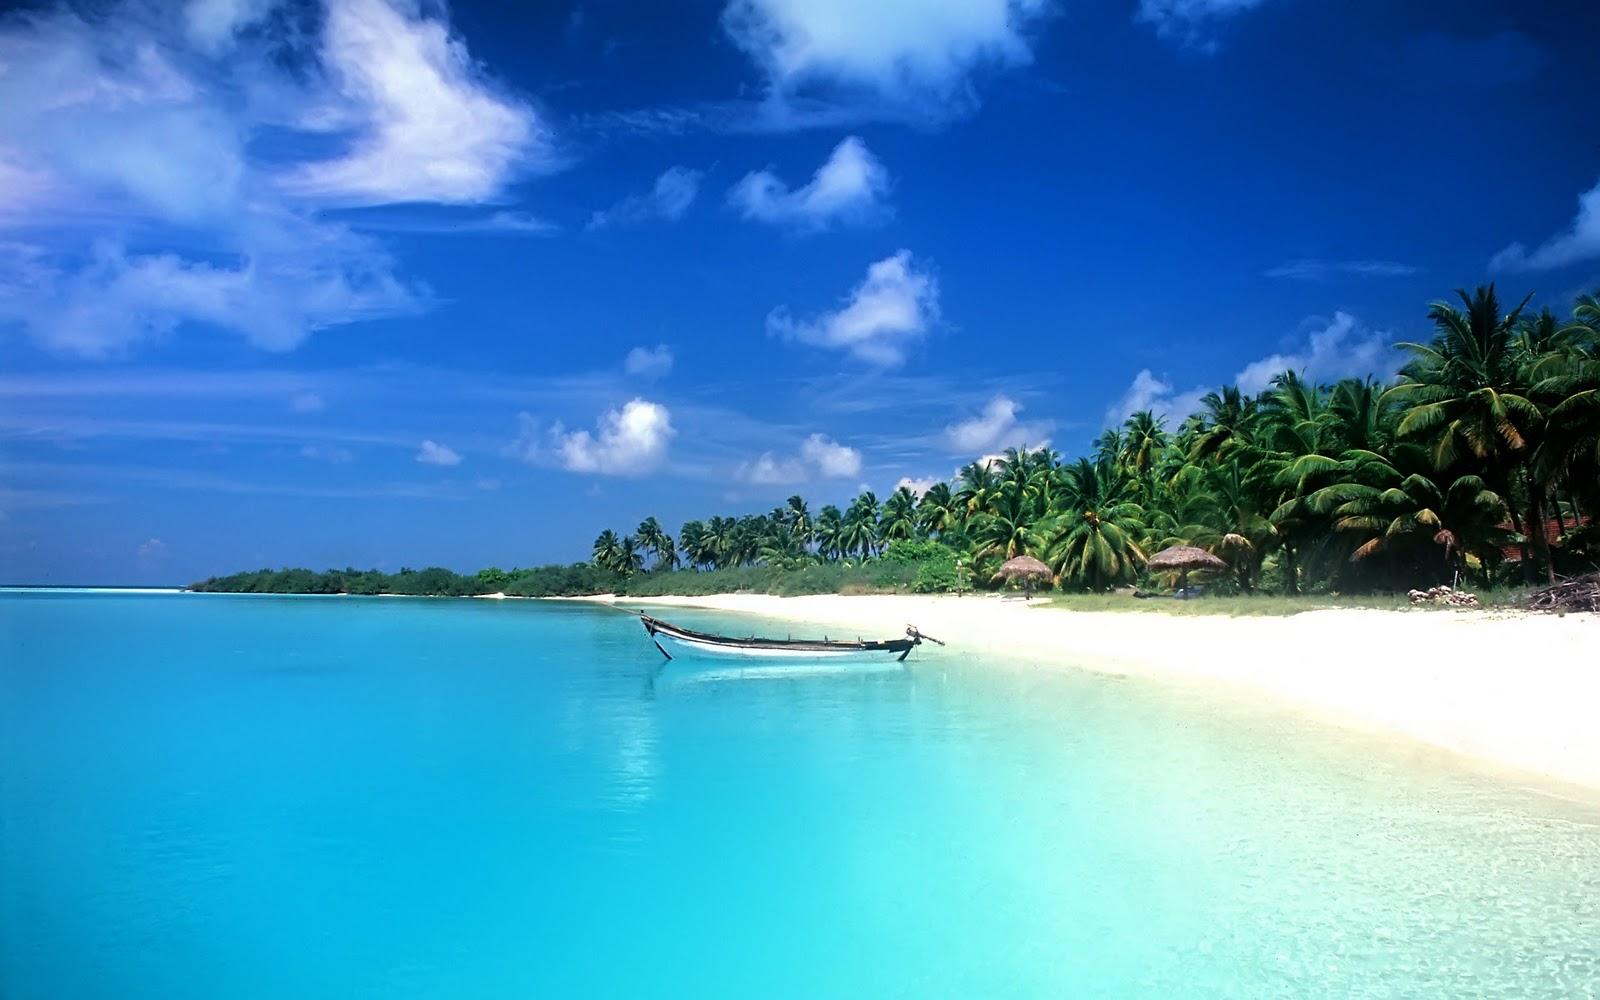 Beach Backgrounds